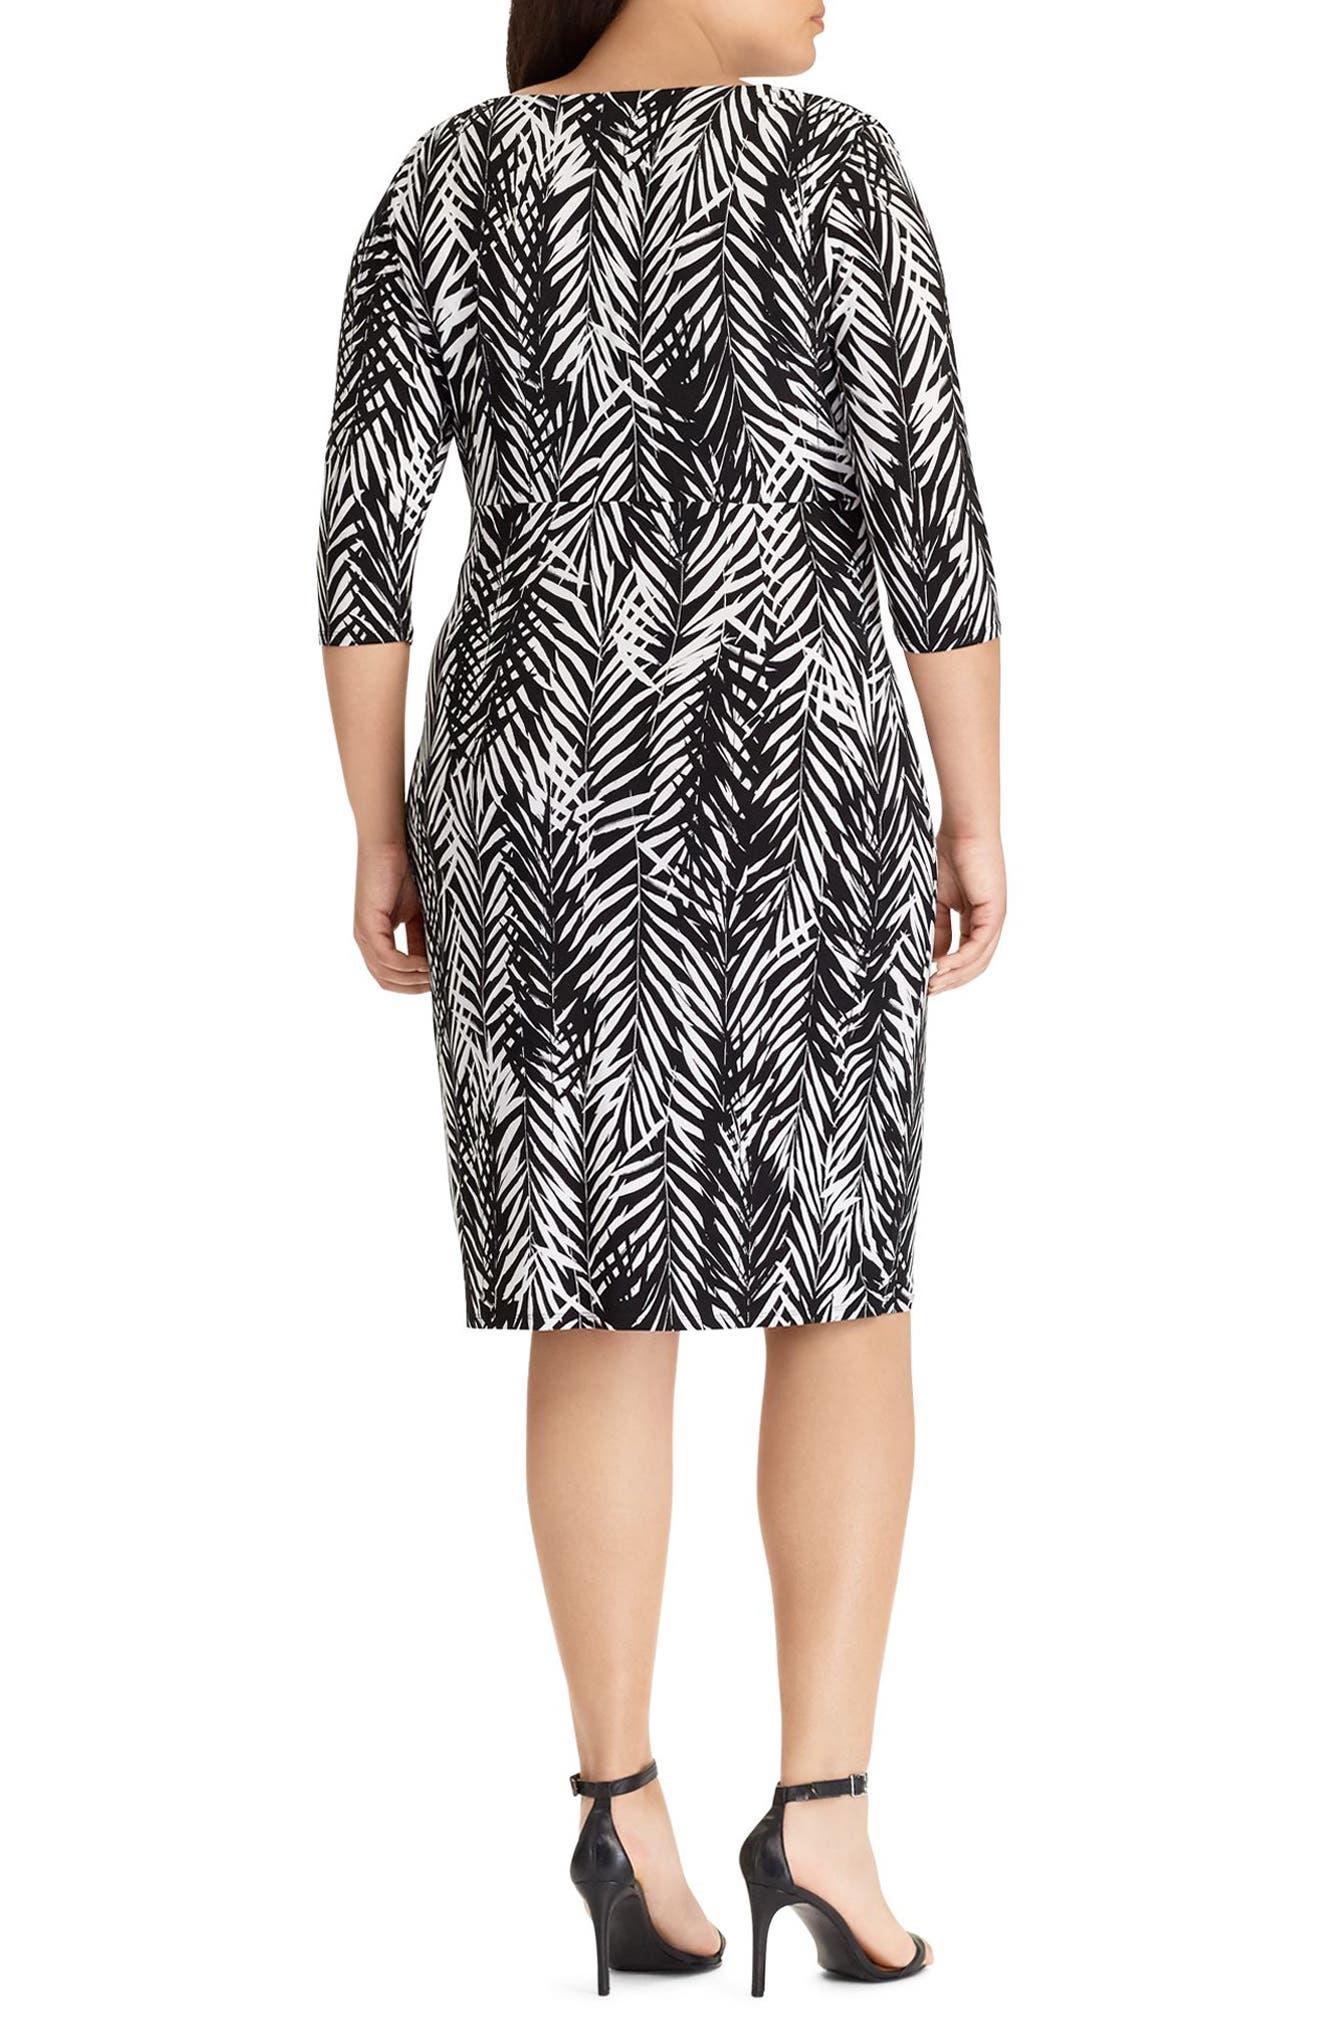 Zebra Twigs Sheath Dress,                             Alternate thumbnail 2, color,                             001